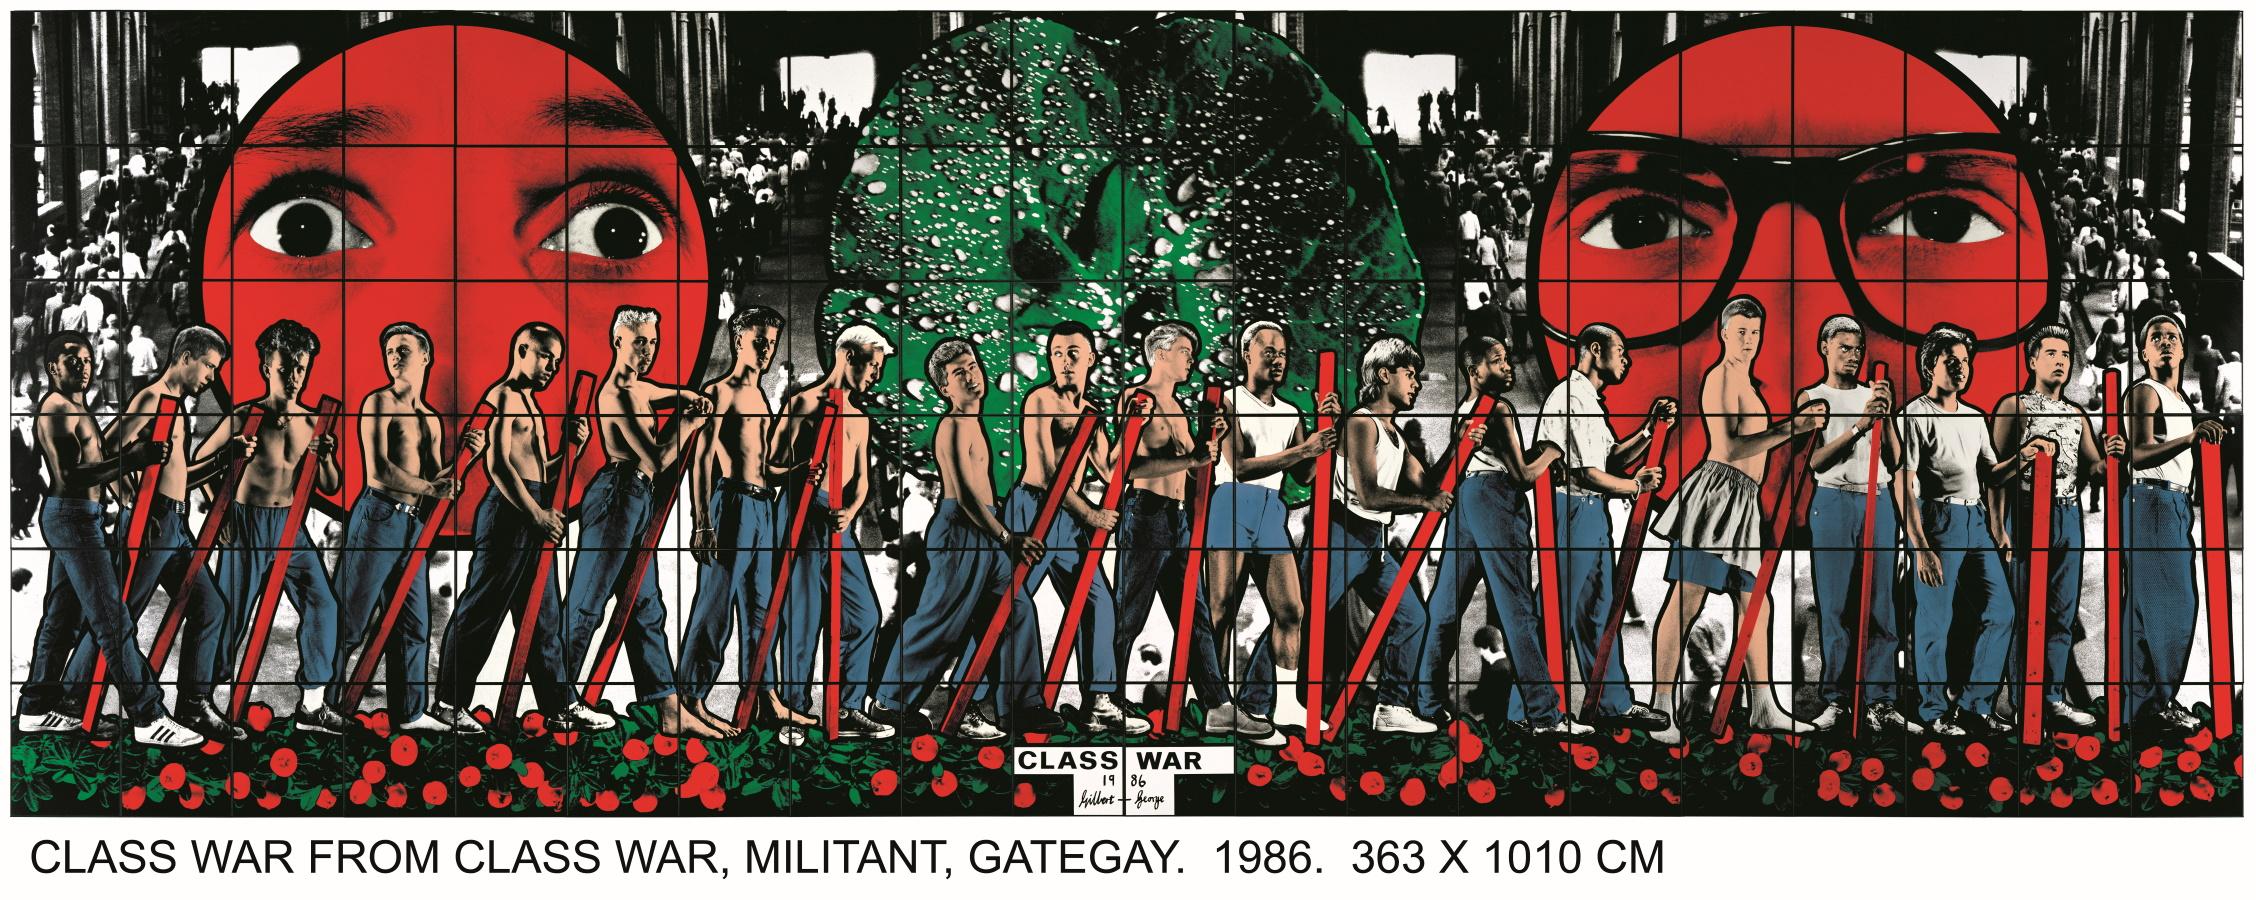 Léger/Gilbert & George, rencontre inattendue